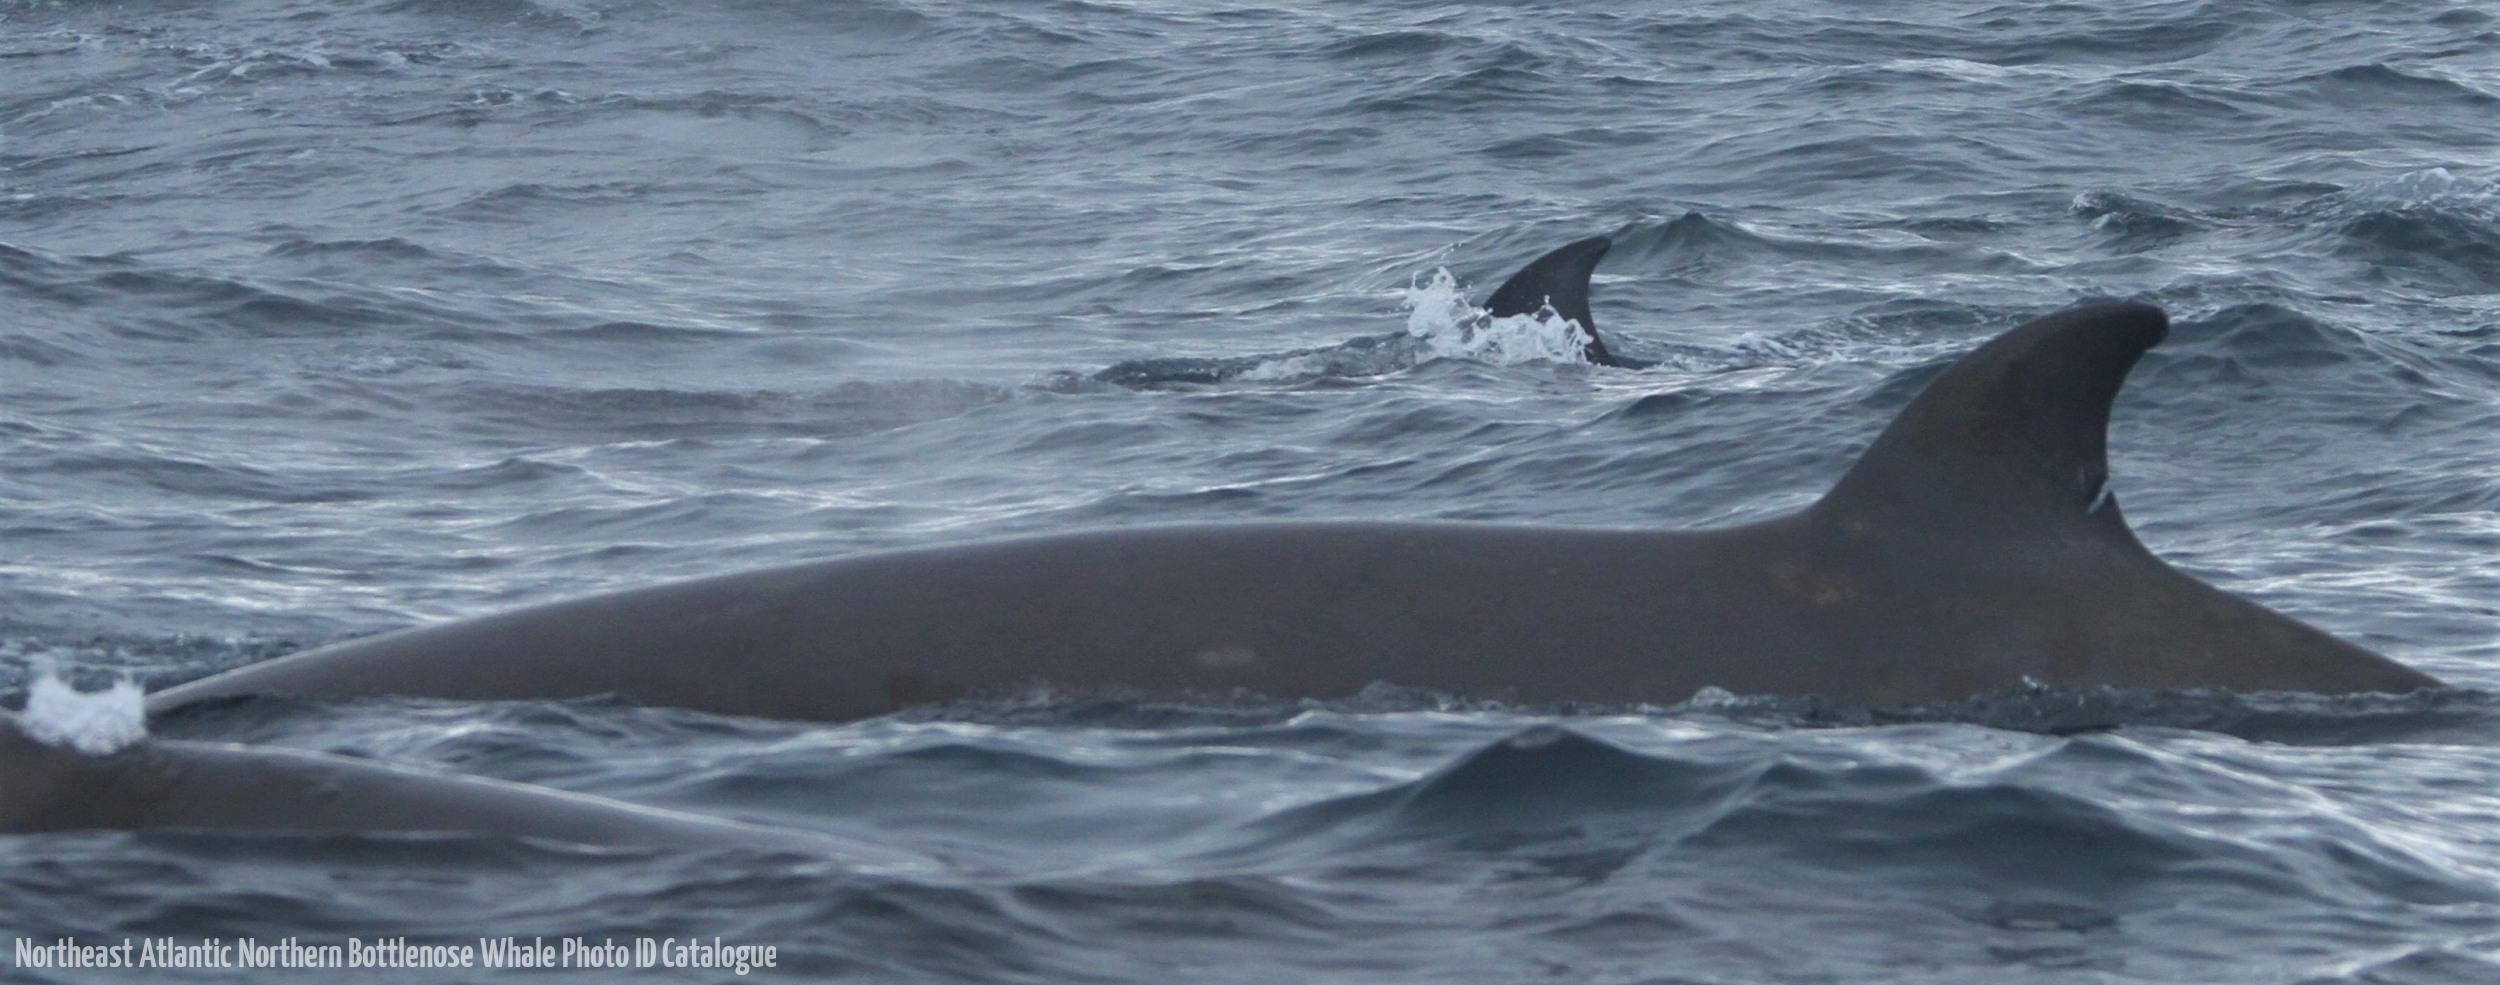 Whale ID: 0016,  Date: 03-07-2013,  Photographer: Paul H. Ensor